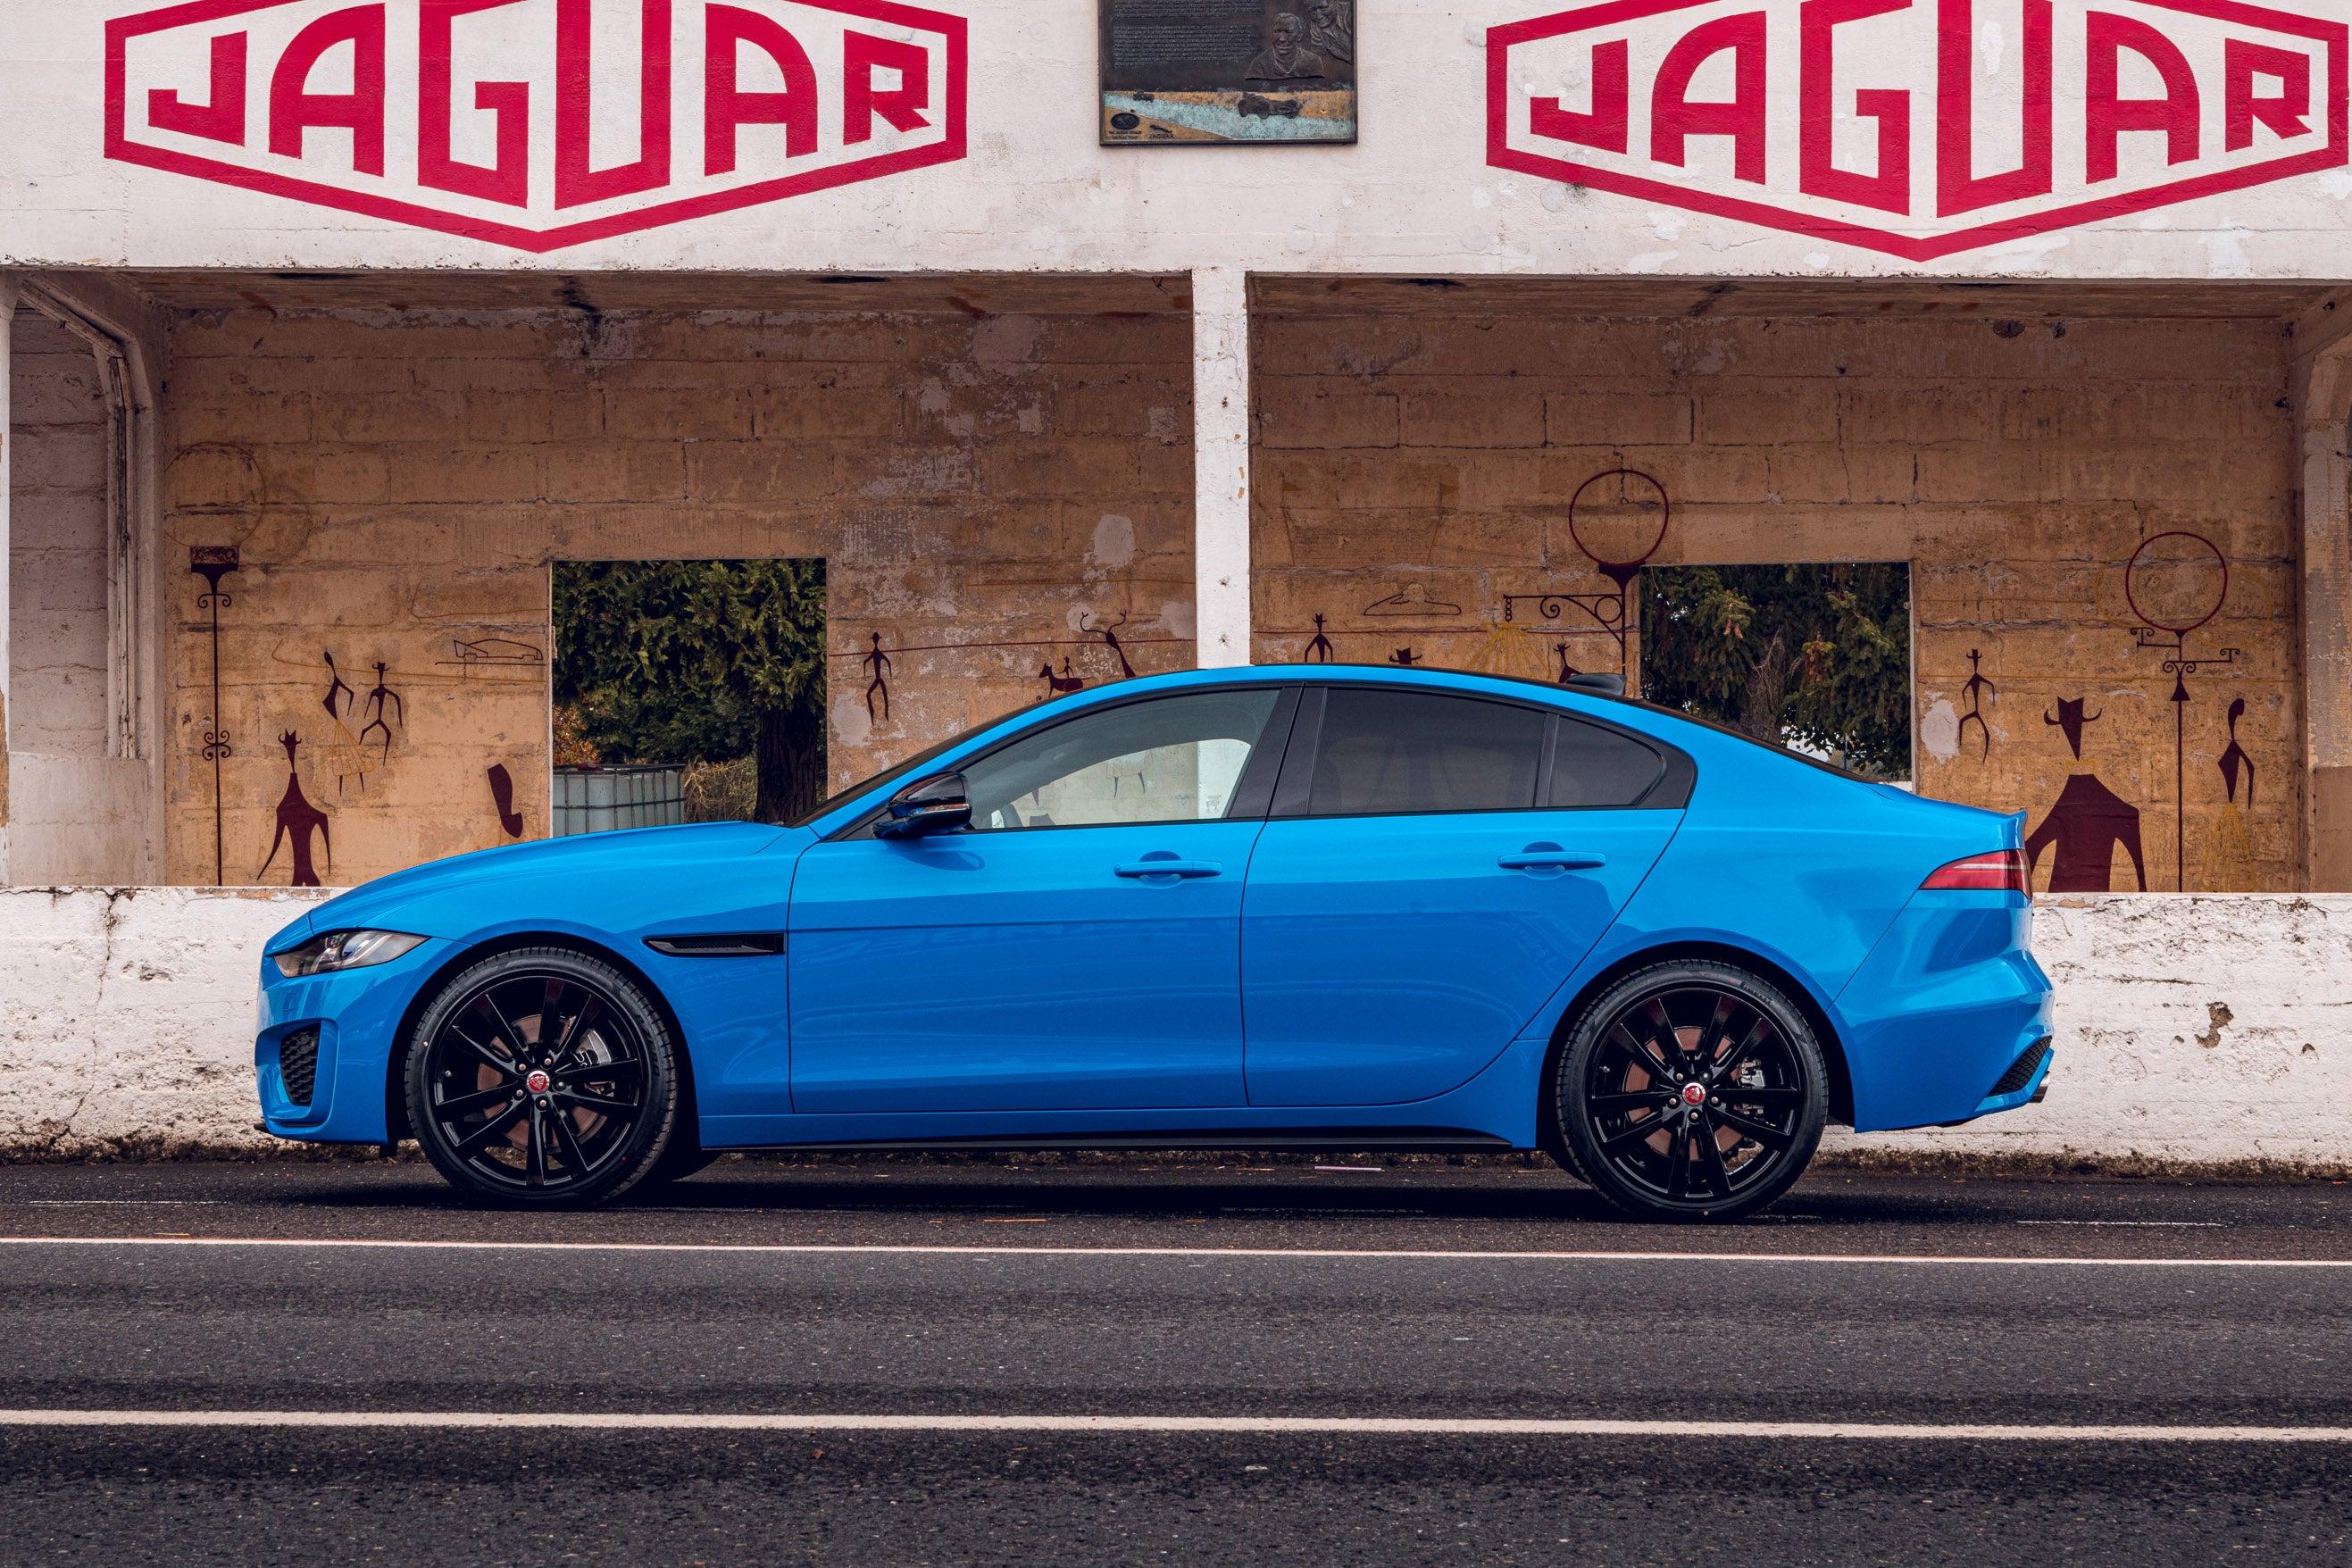 Jaguar XE left exterior